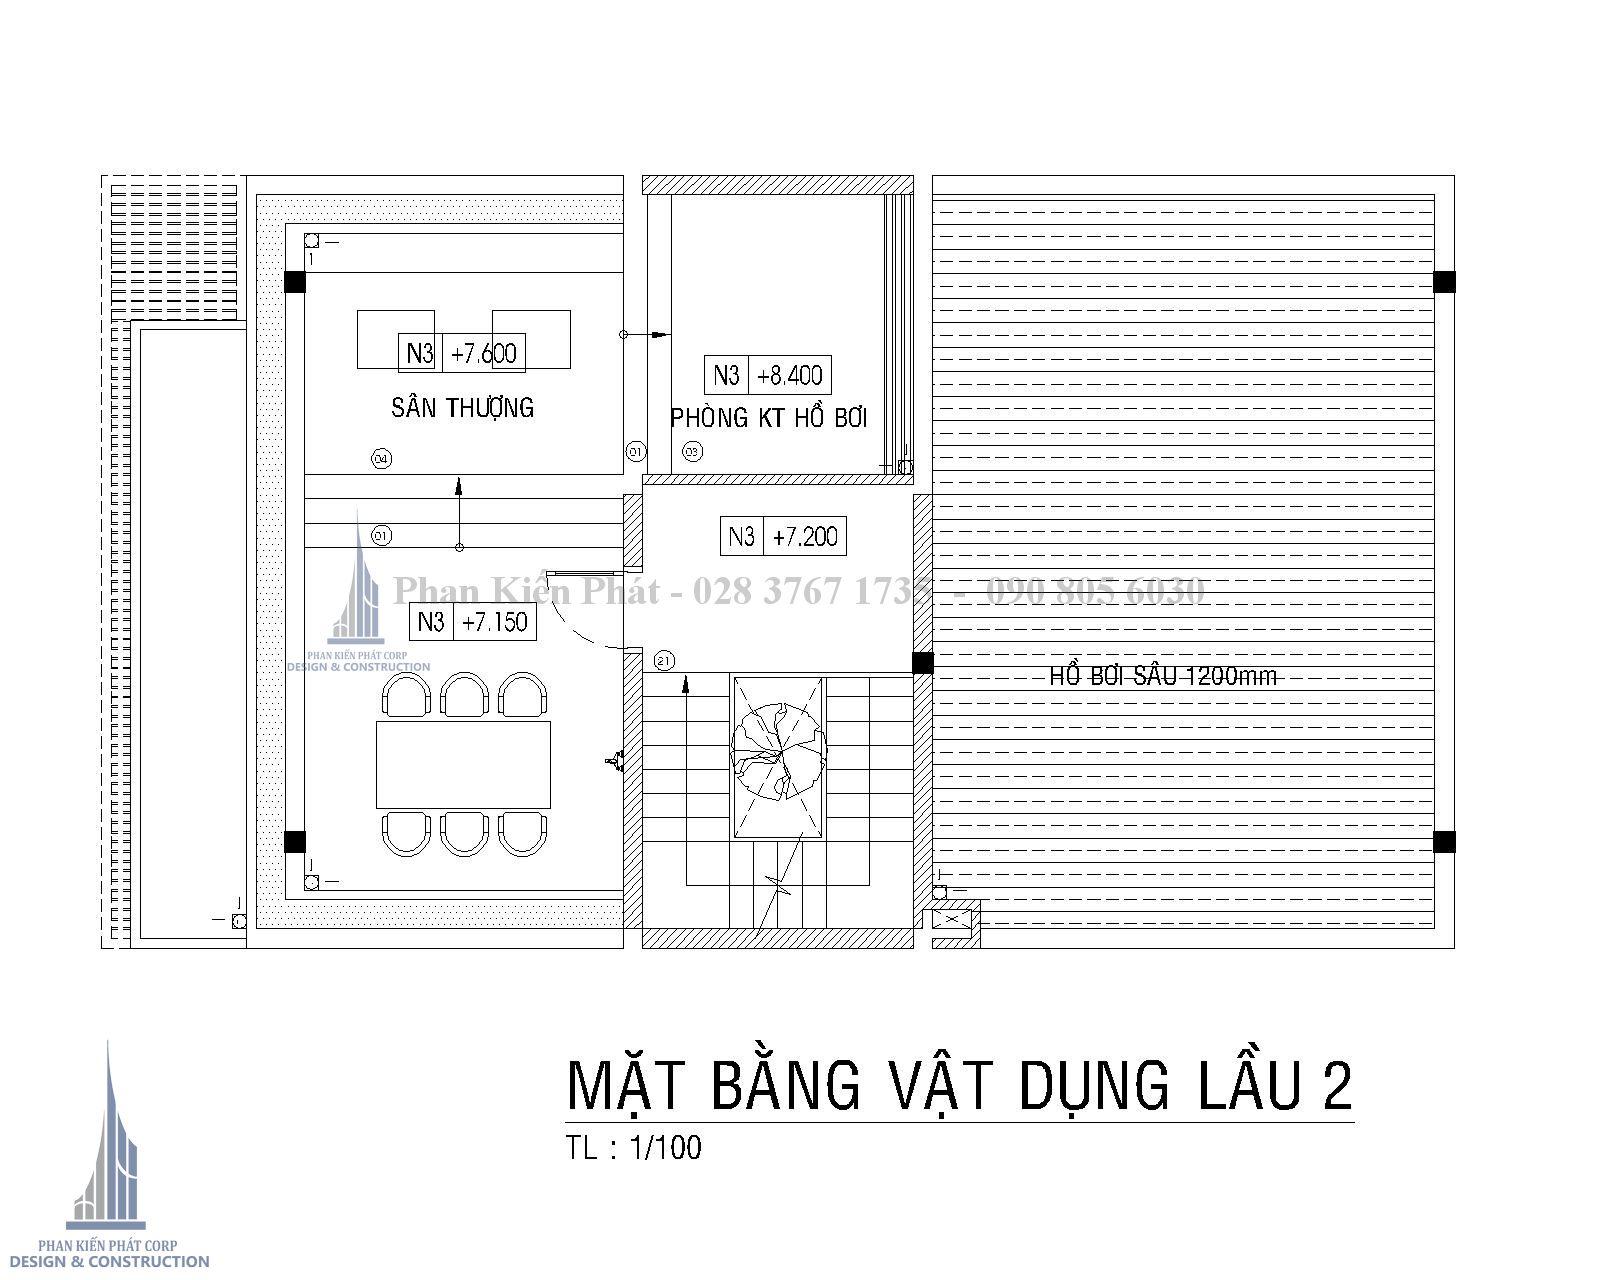 Mat Bang Lau 2 Biet Thu Pho Hien Dai Binh Phuoc Tkxn